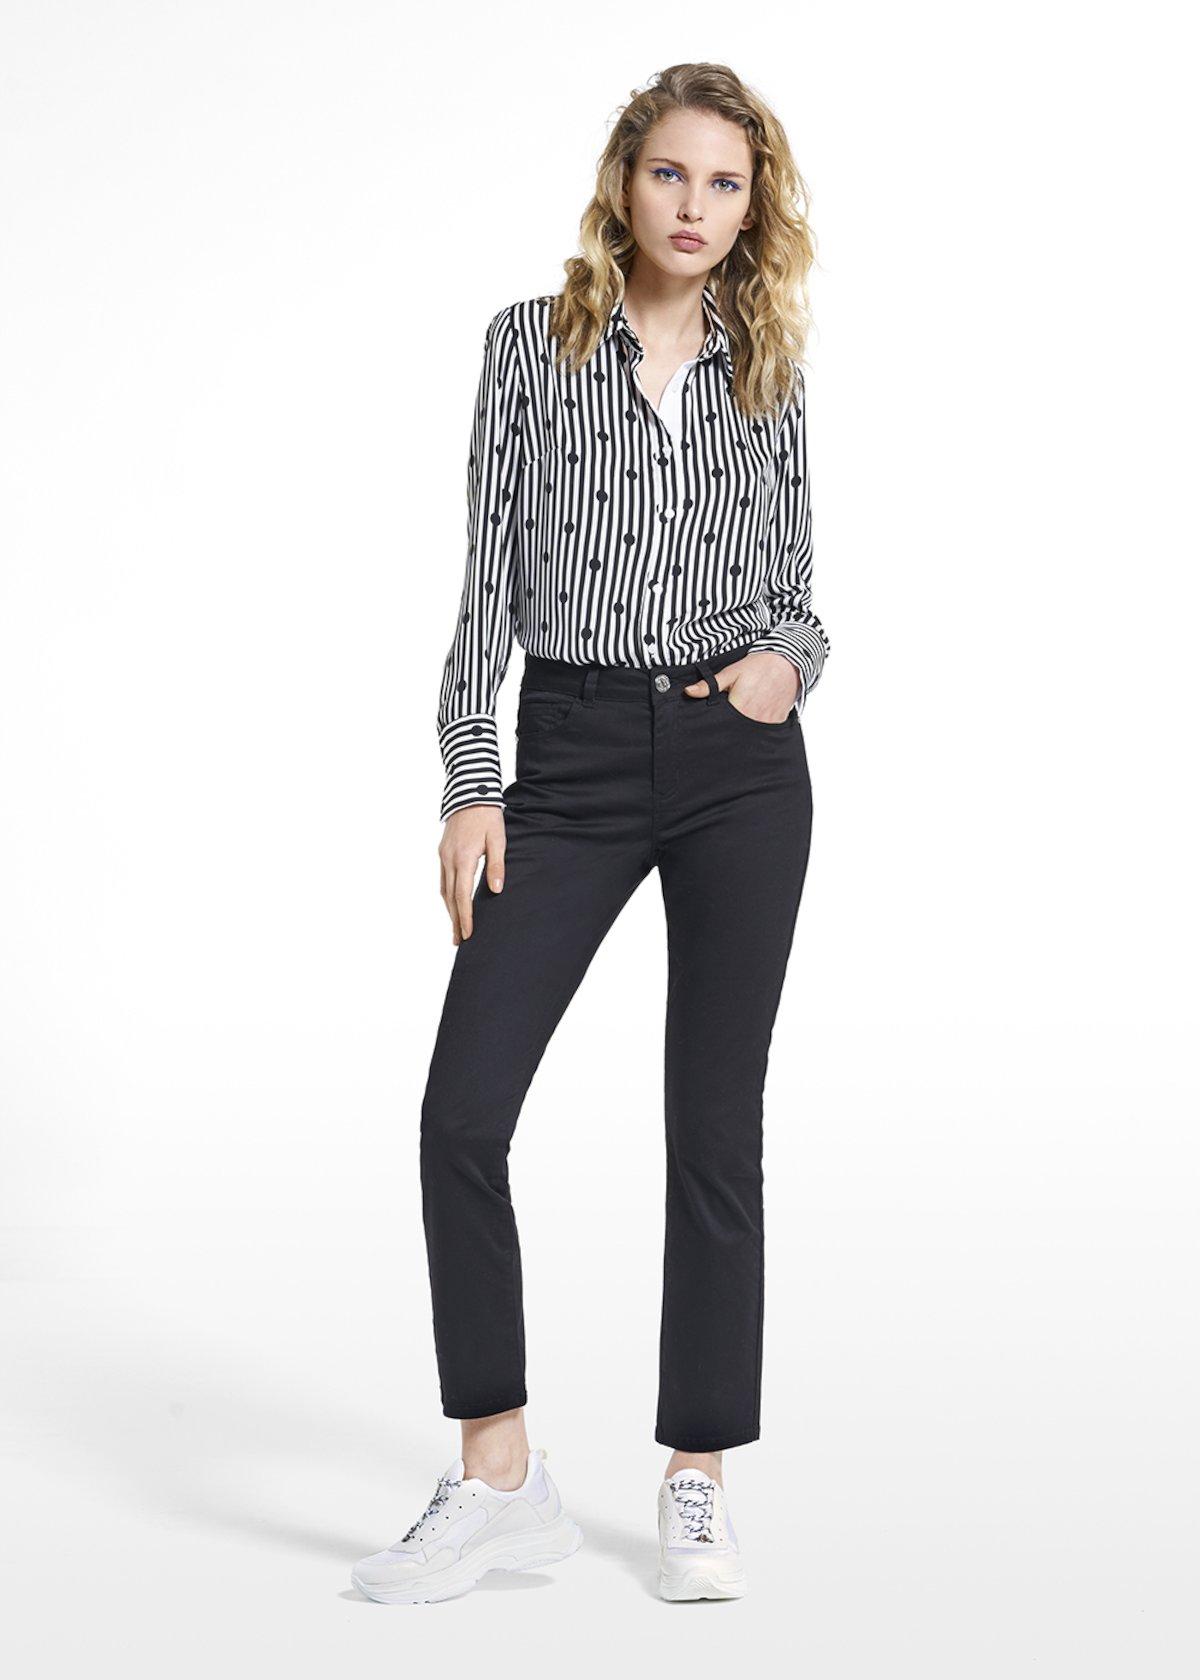 Long-sleeved patterned blouse Carla - White / Black Stripes - Woman